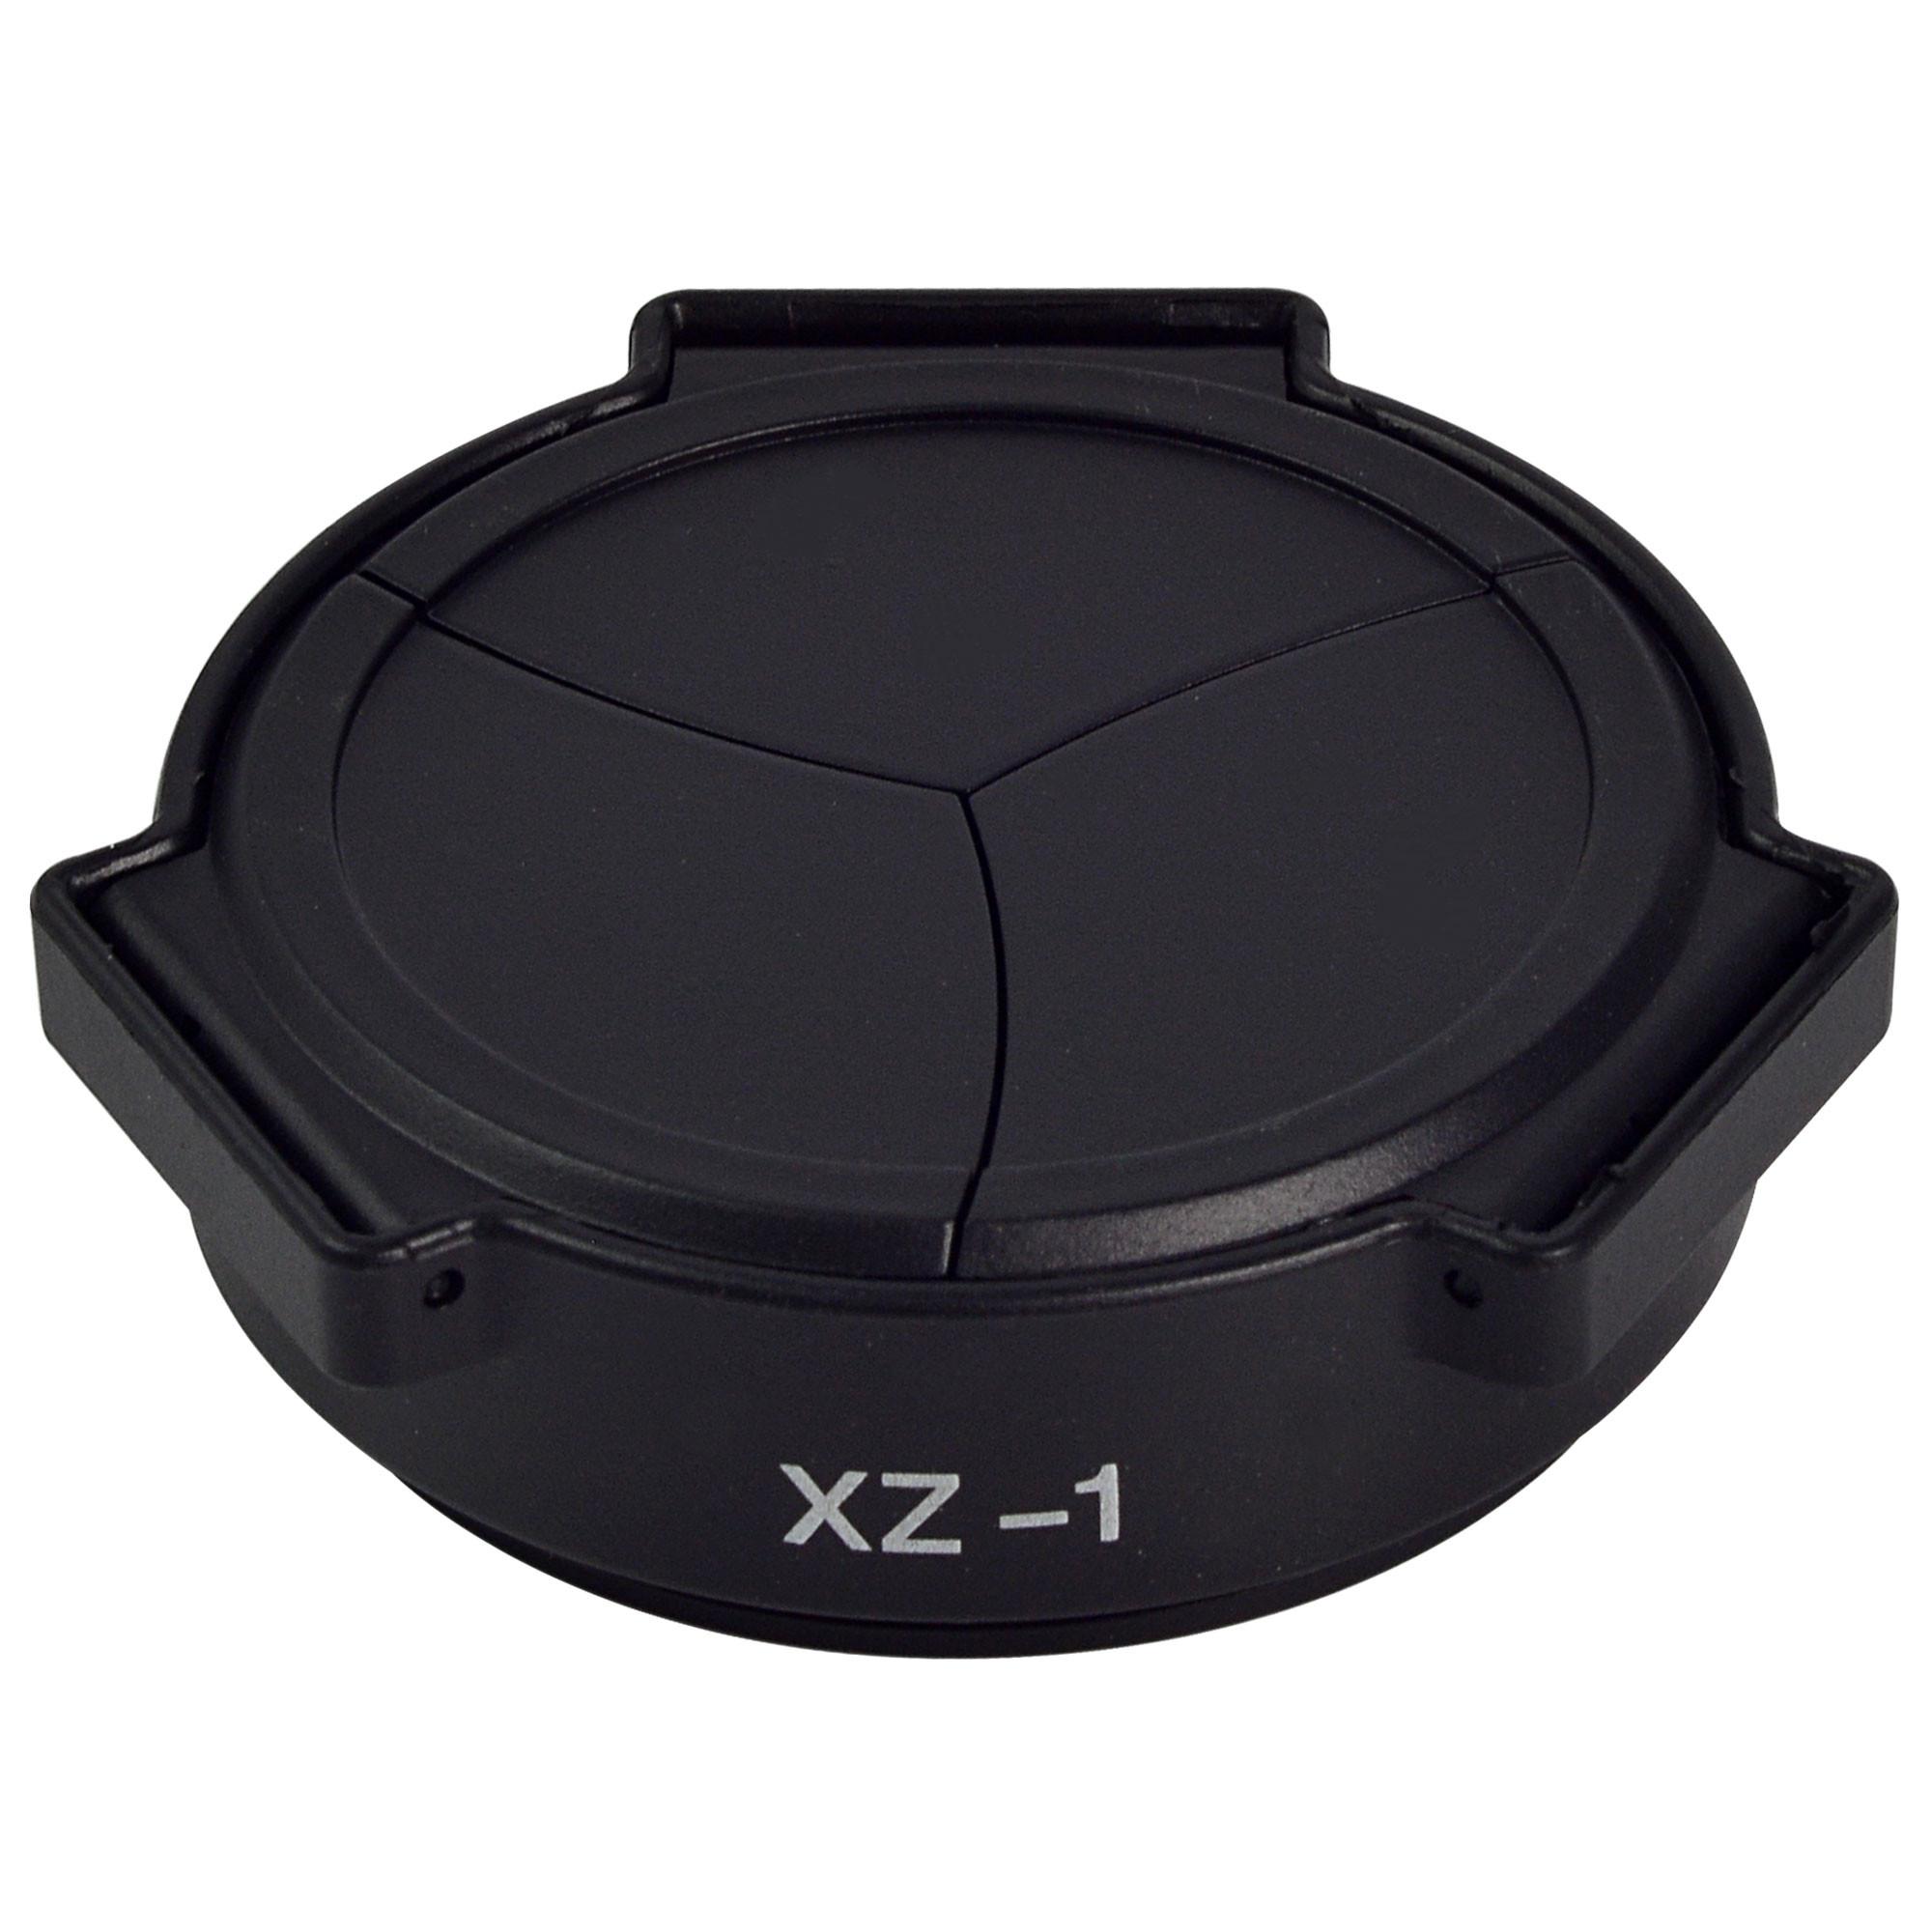 MENGS® XZ-1 Self-Retaining Auto Open Close Sync Lens Cap for Olympus XZ-1 Camera